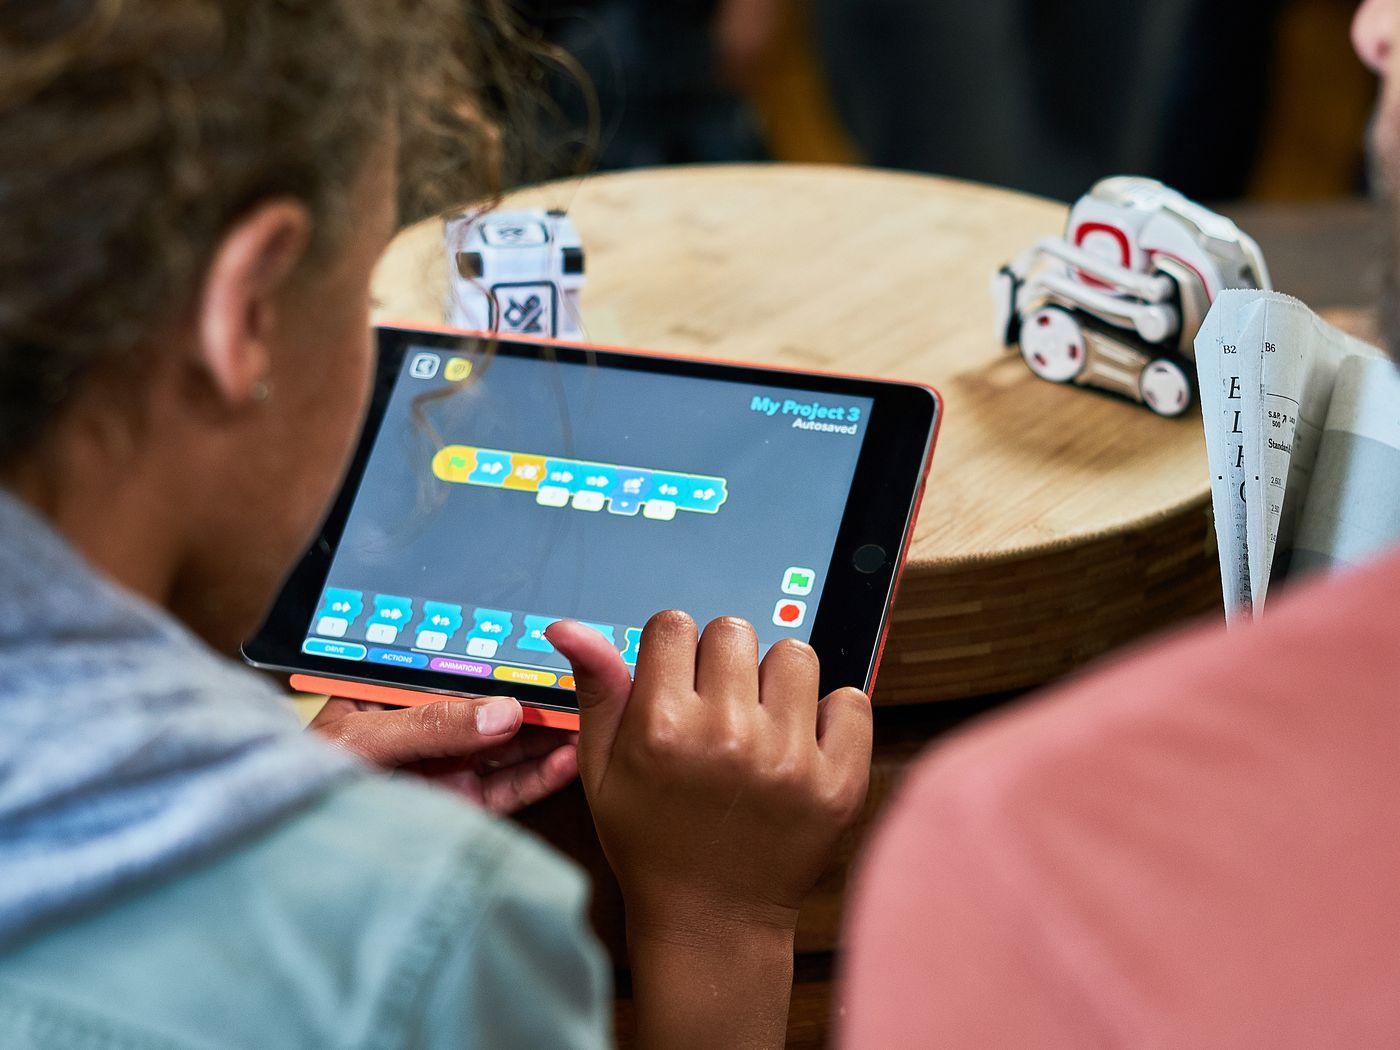 Anki's Cozmo robot now has a visual programming mode to teach kids